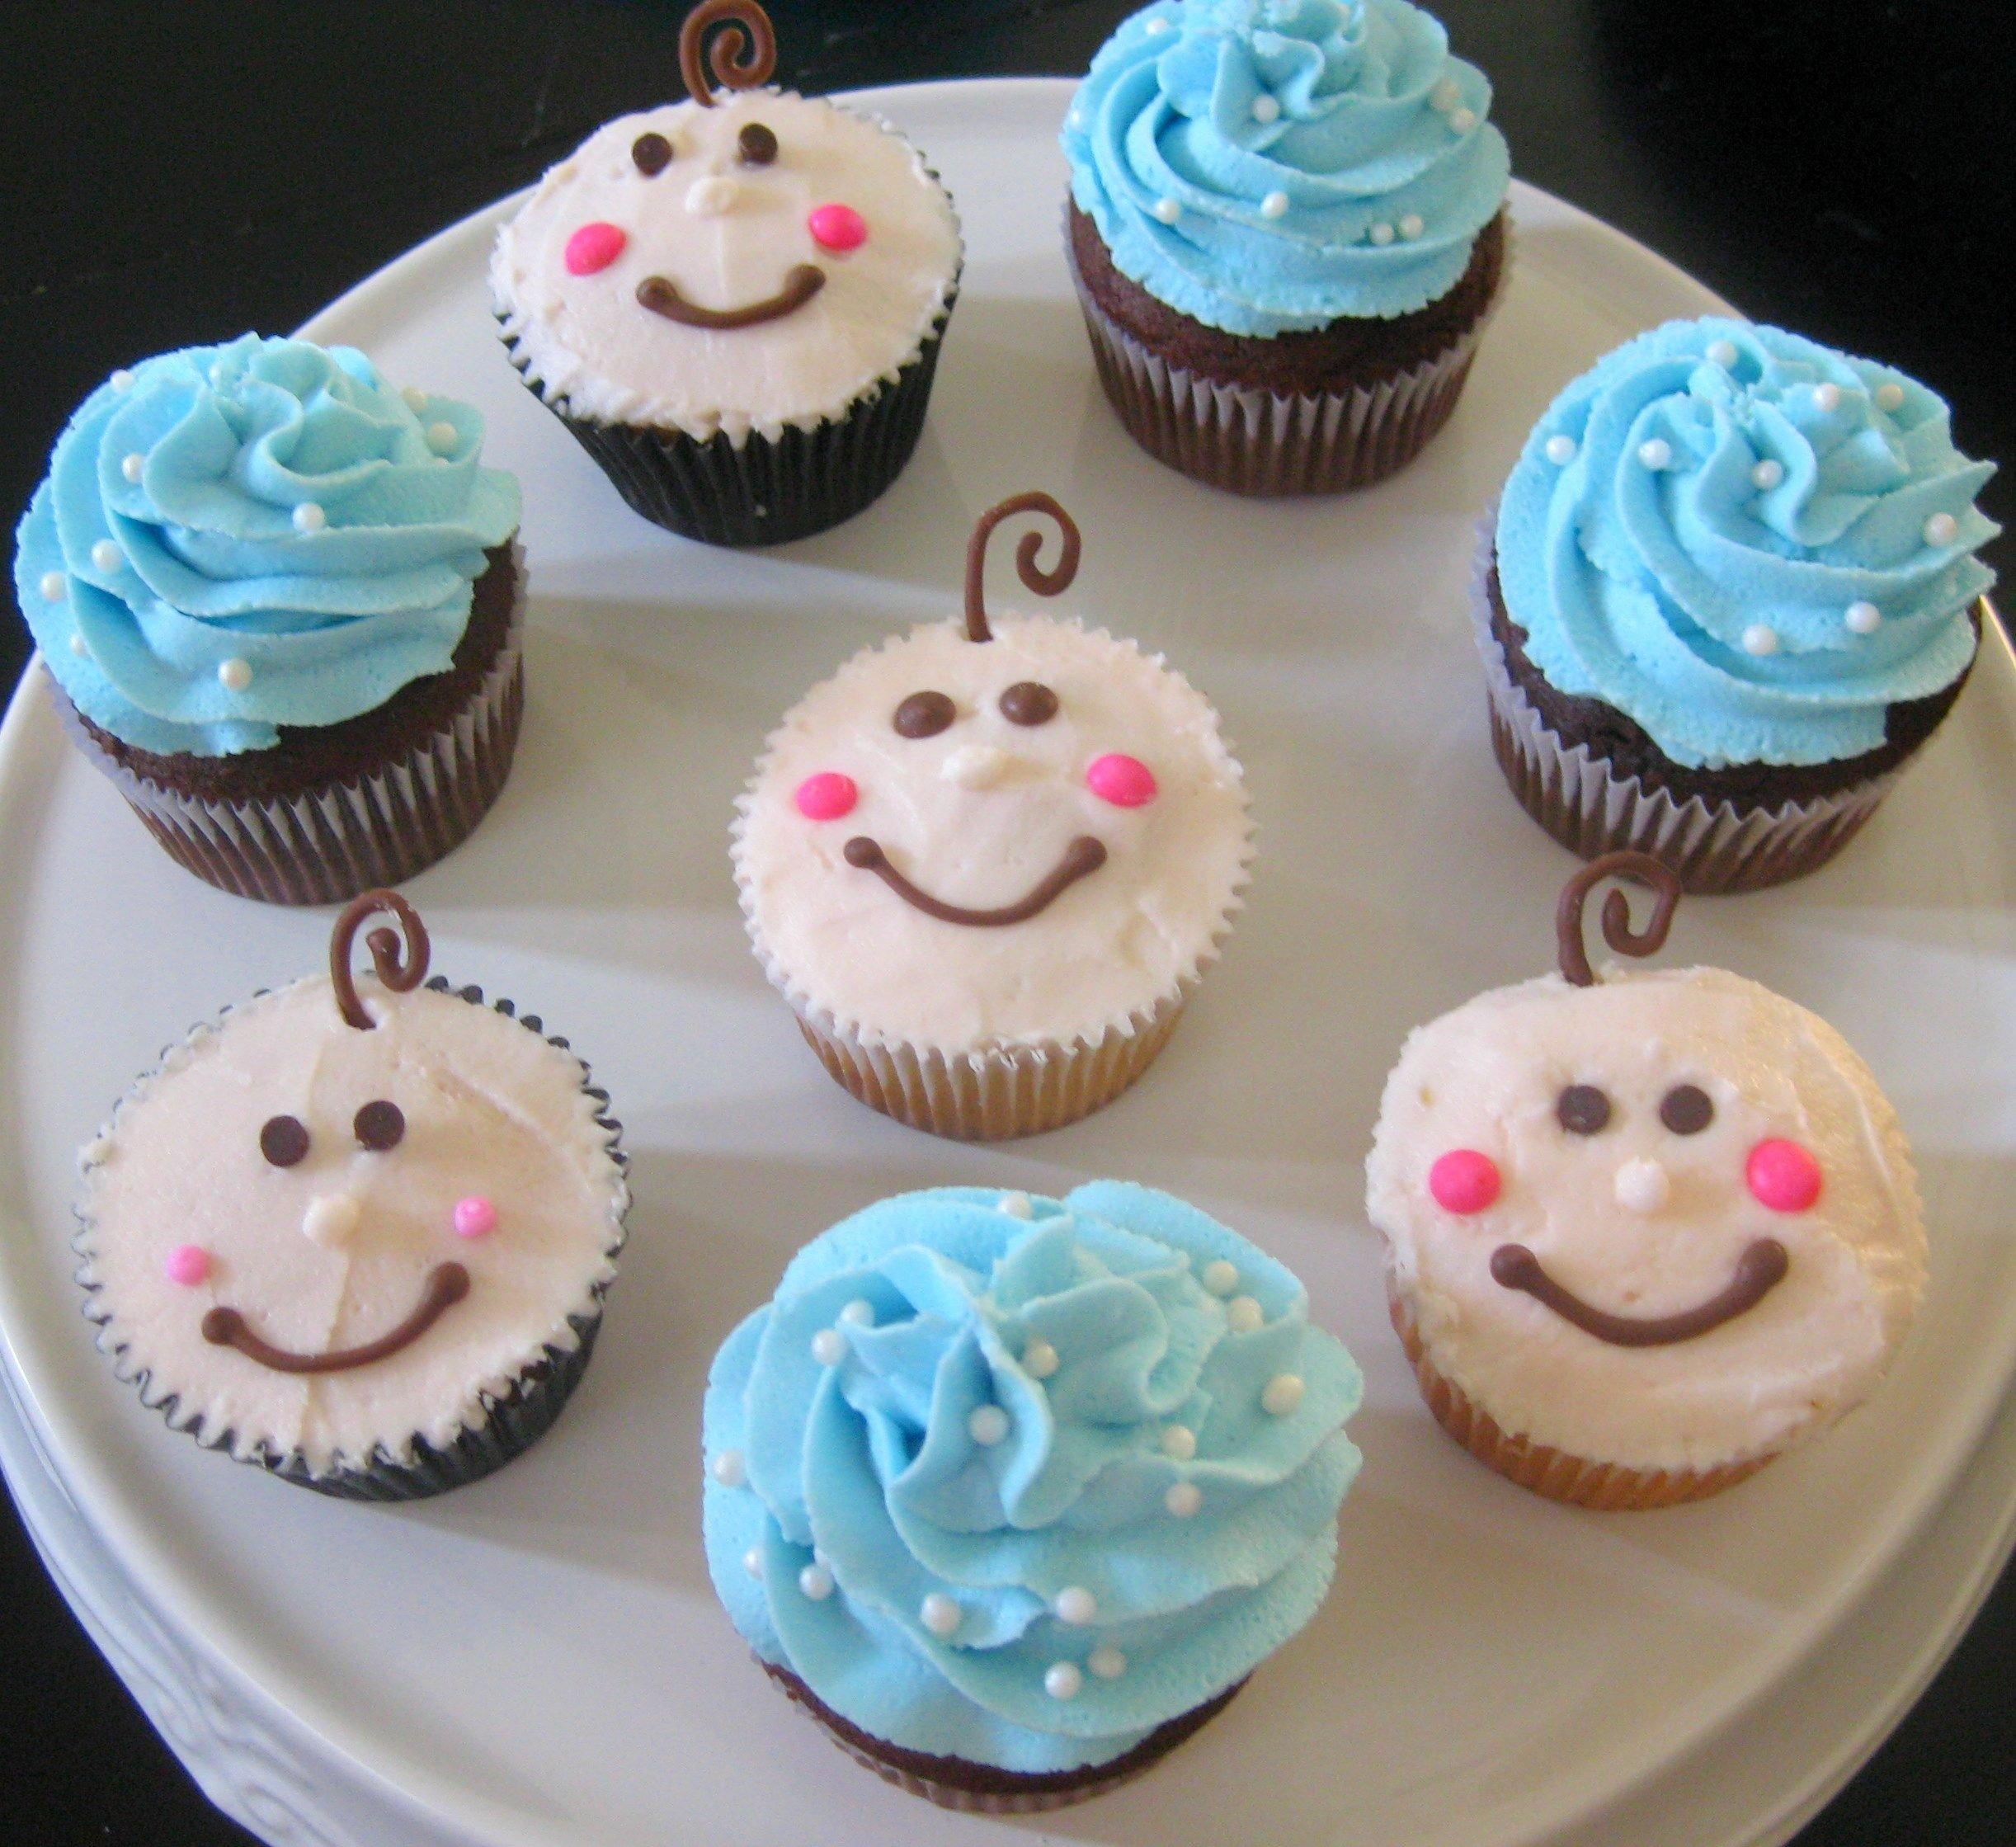 10 Fantastic Boy Baby Shower Cupcake Ideas cute baby shower cupcakes for boys baby shower cake pinterest 2